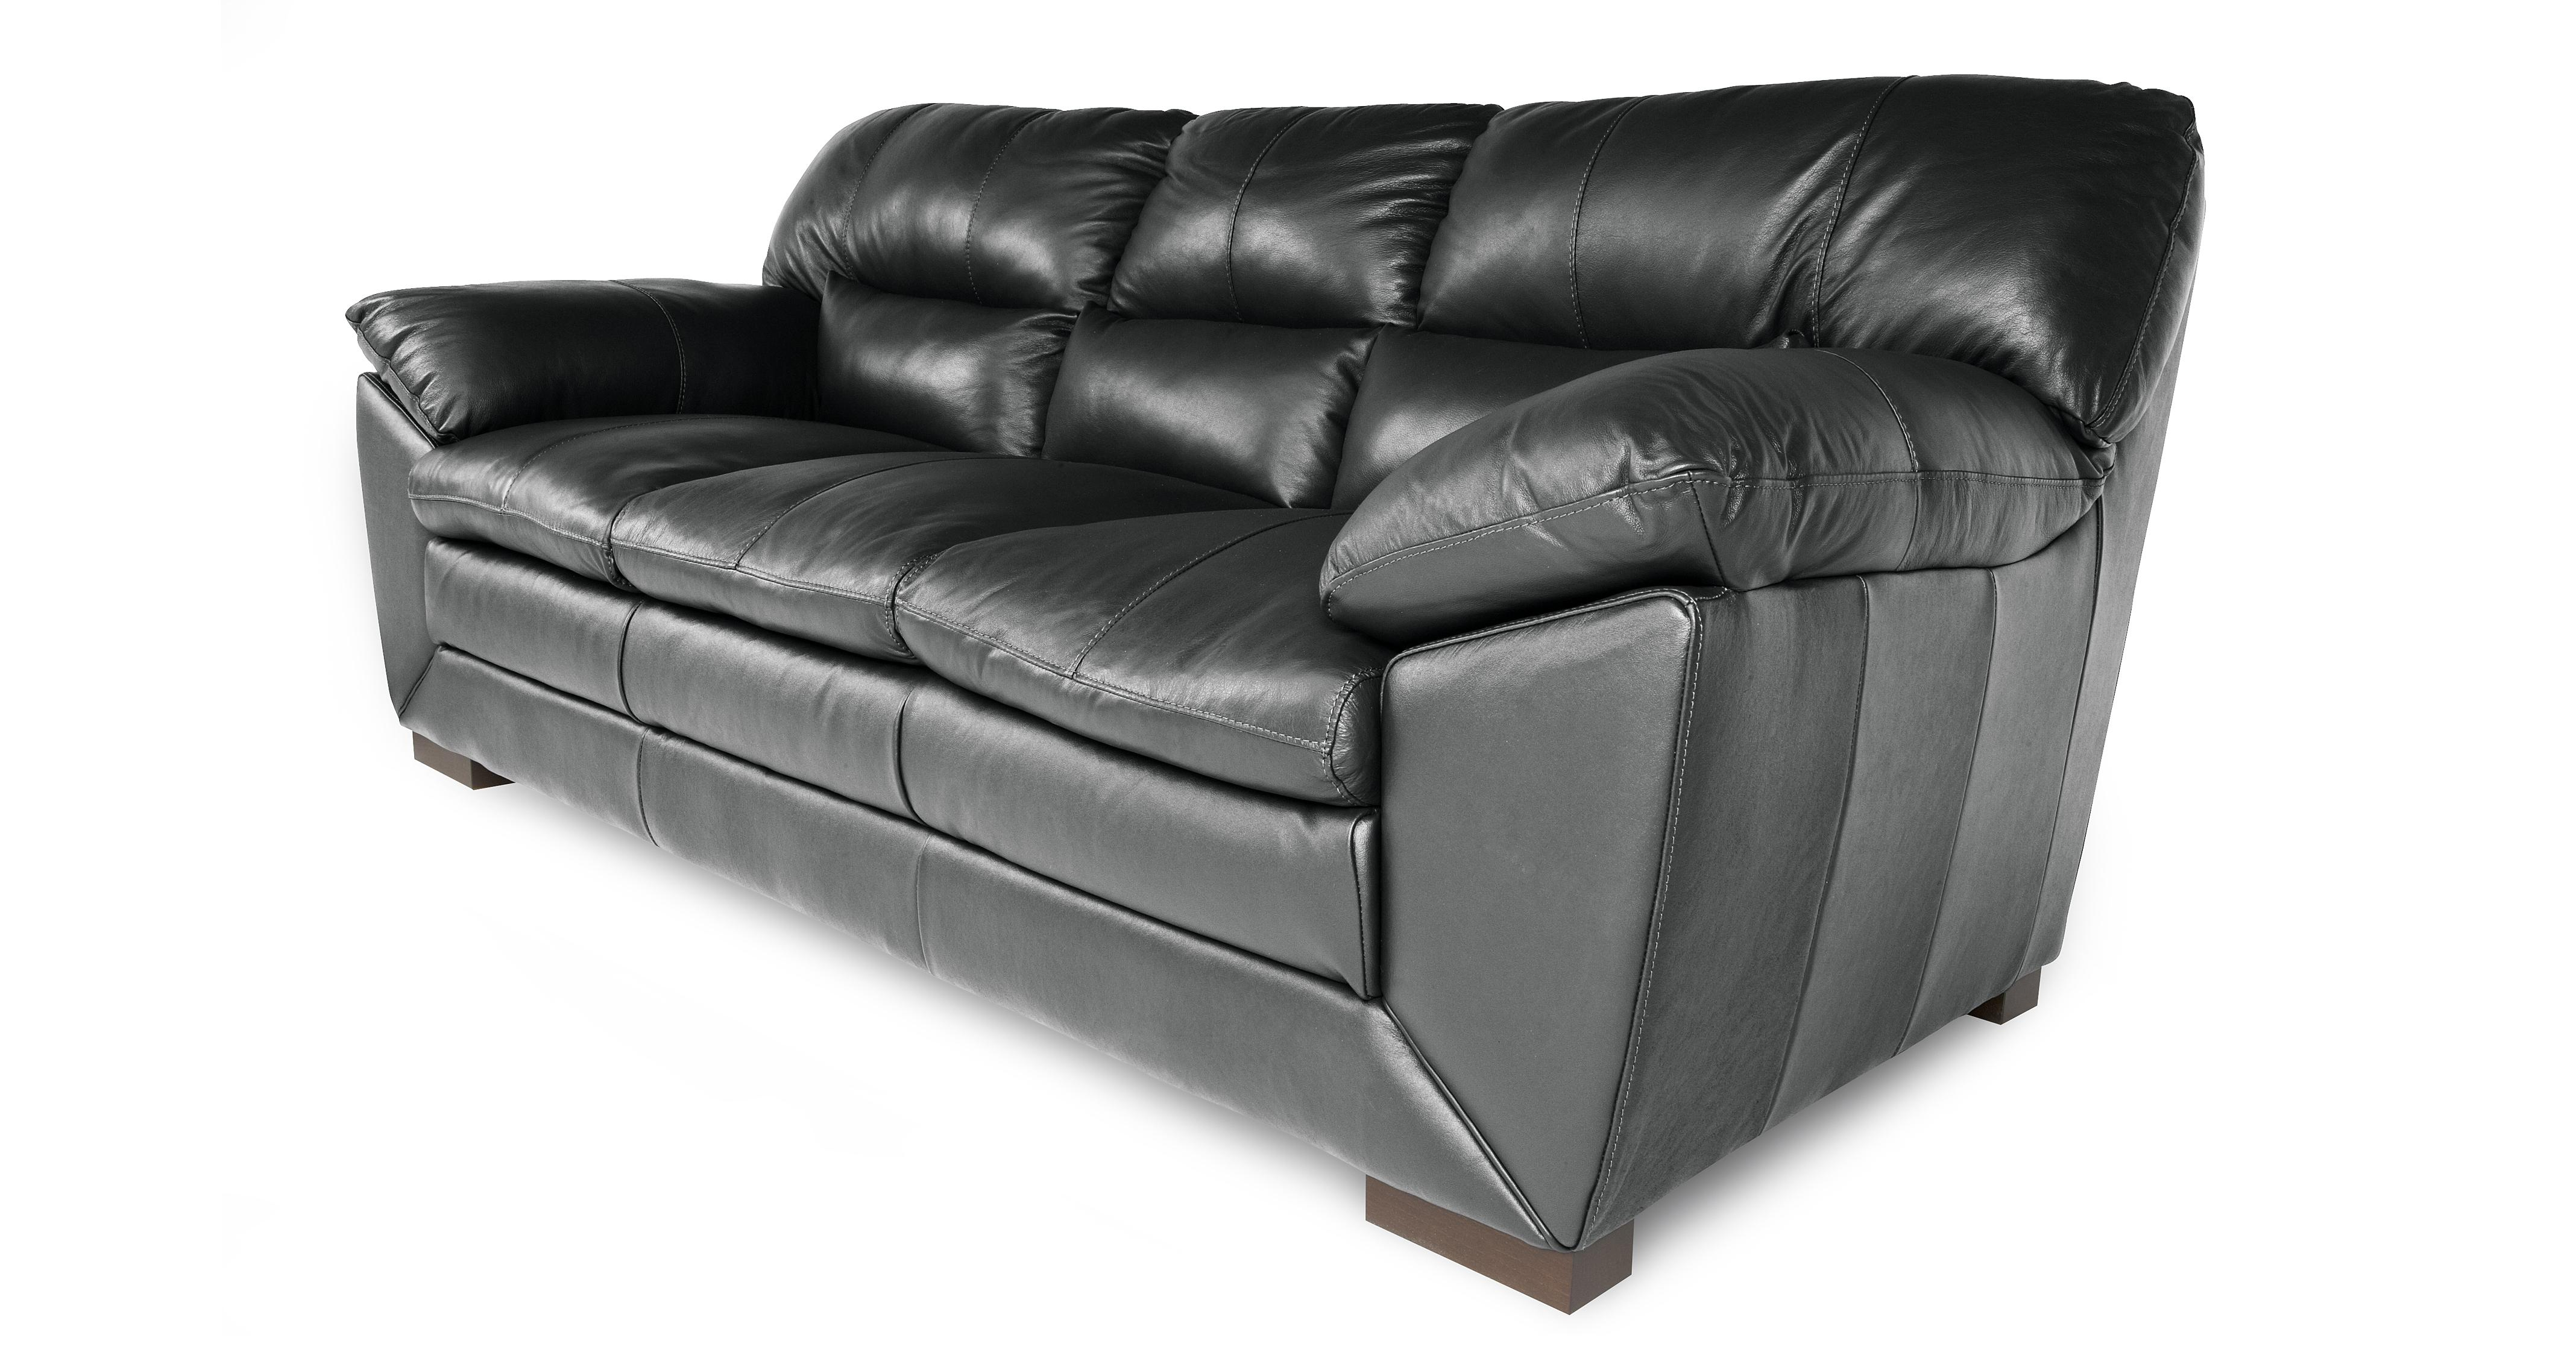 3 seater leather sofa dfs sofas phoenix new valiant black ebay